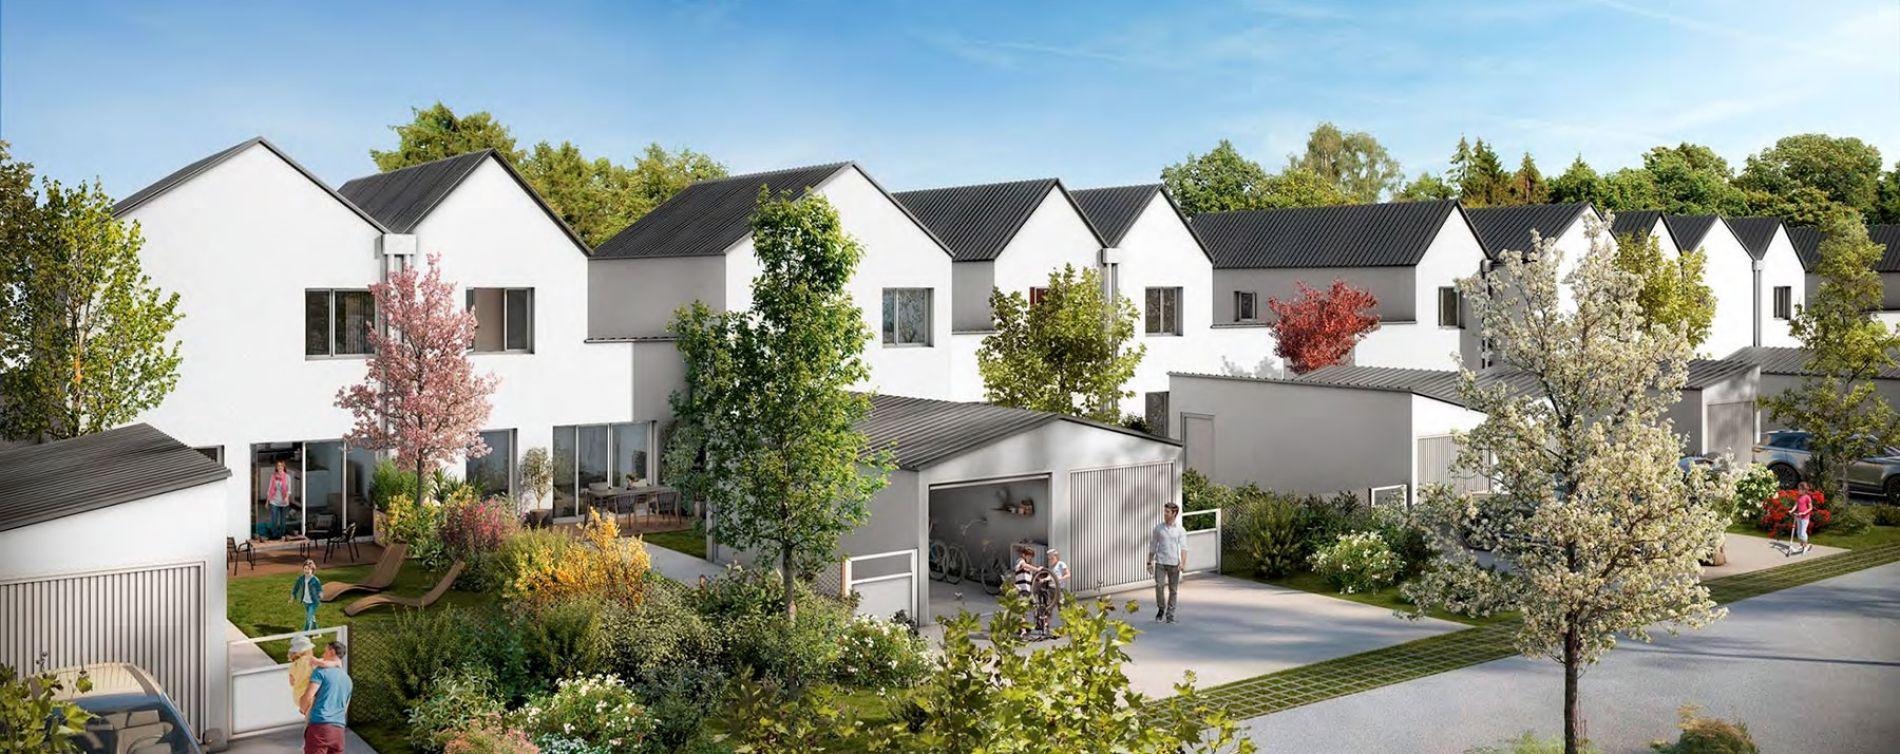 Beauzelle : programme immobilier neuve « Garden Street » en Loi Pinel